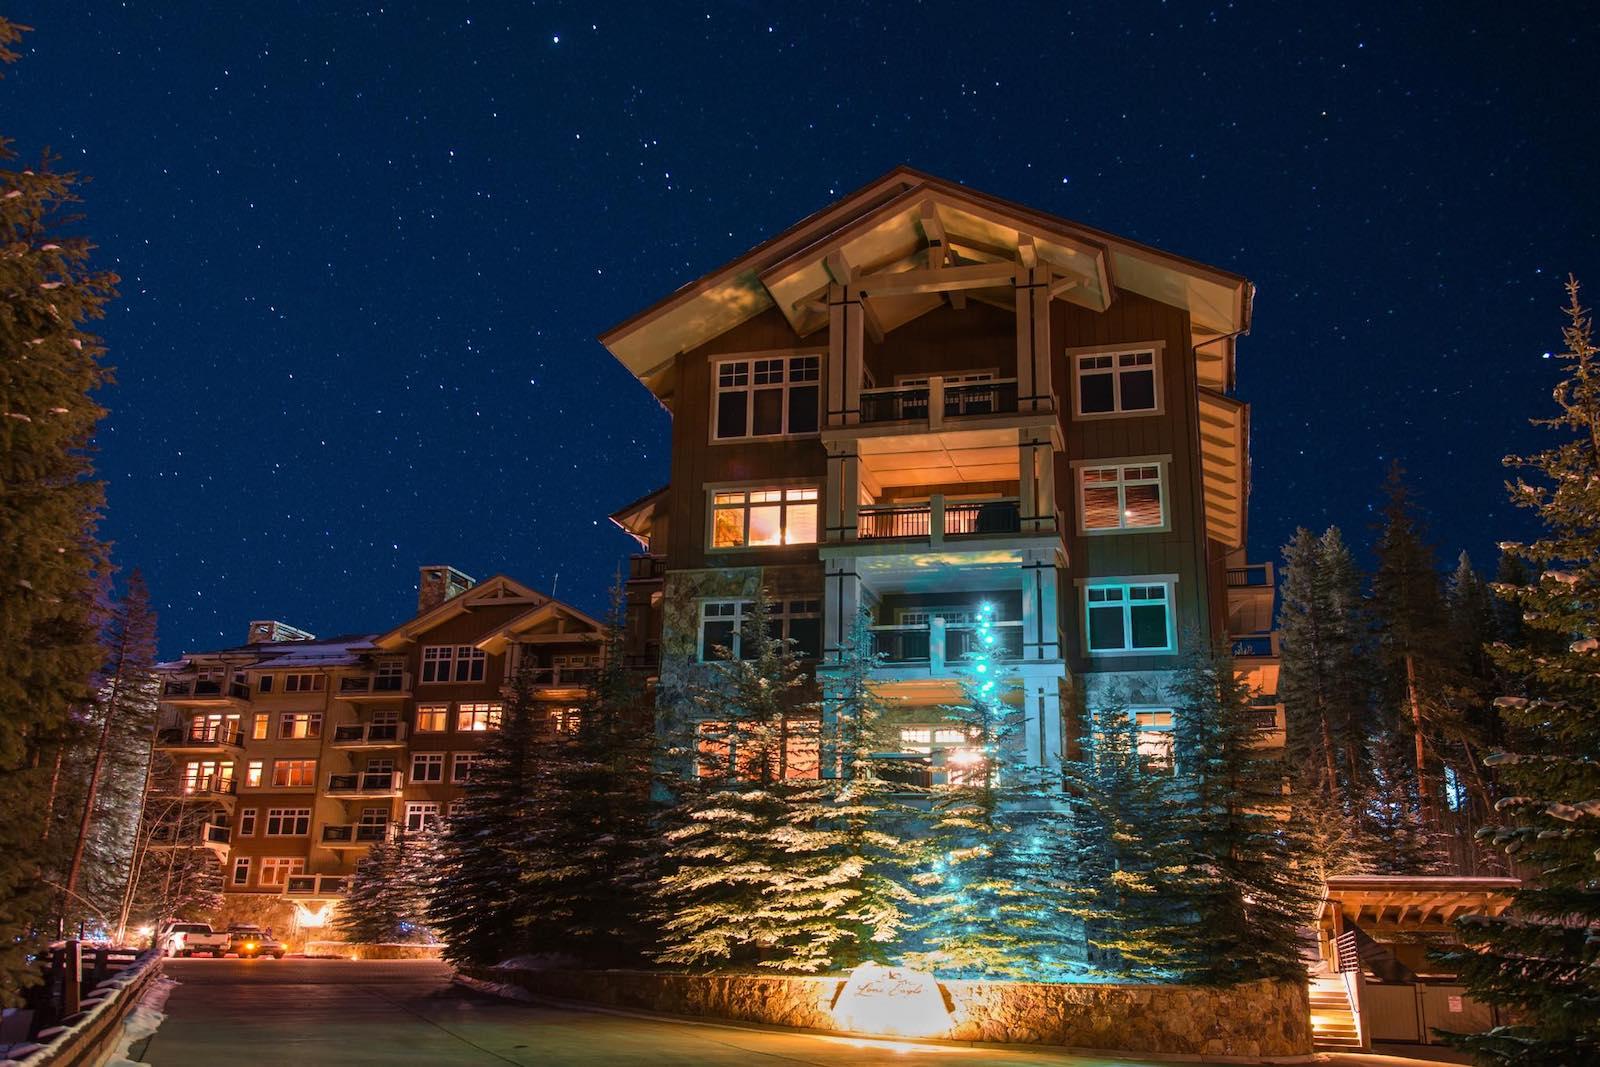 Gambar Keystone Resort di malam hari di Colorado